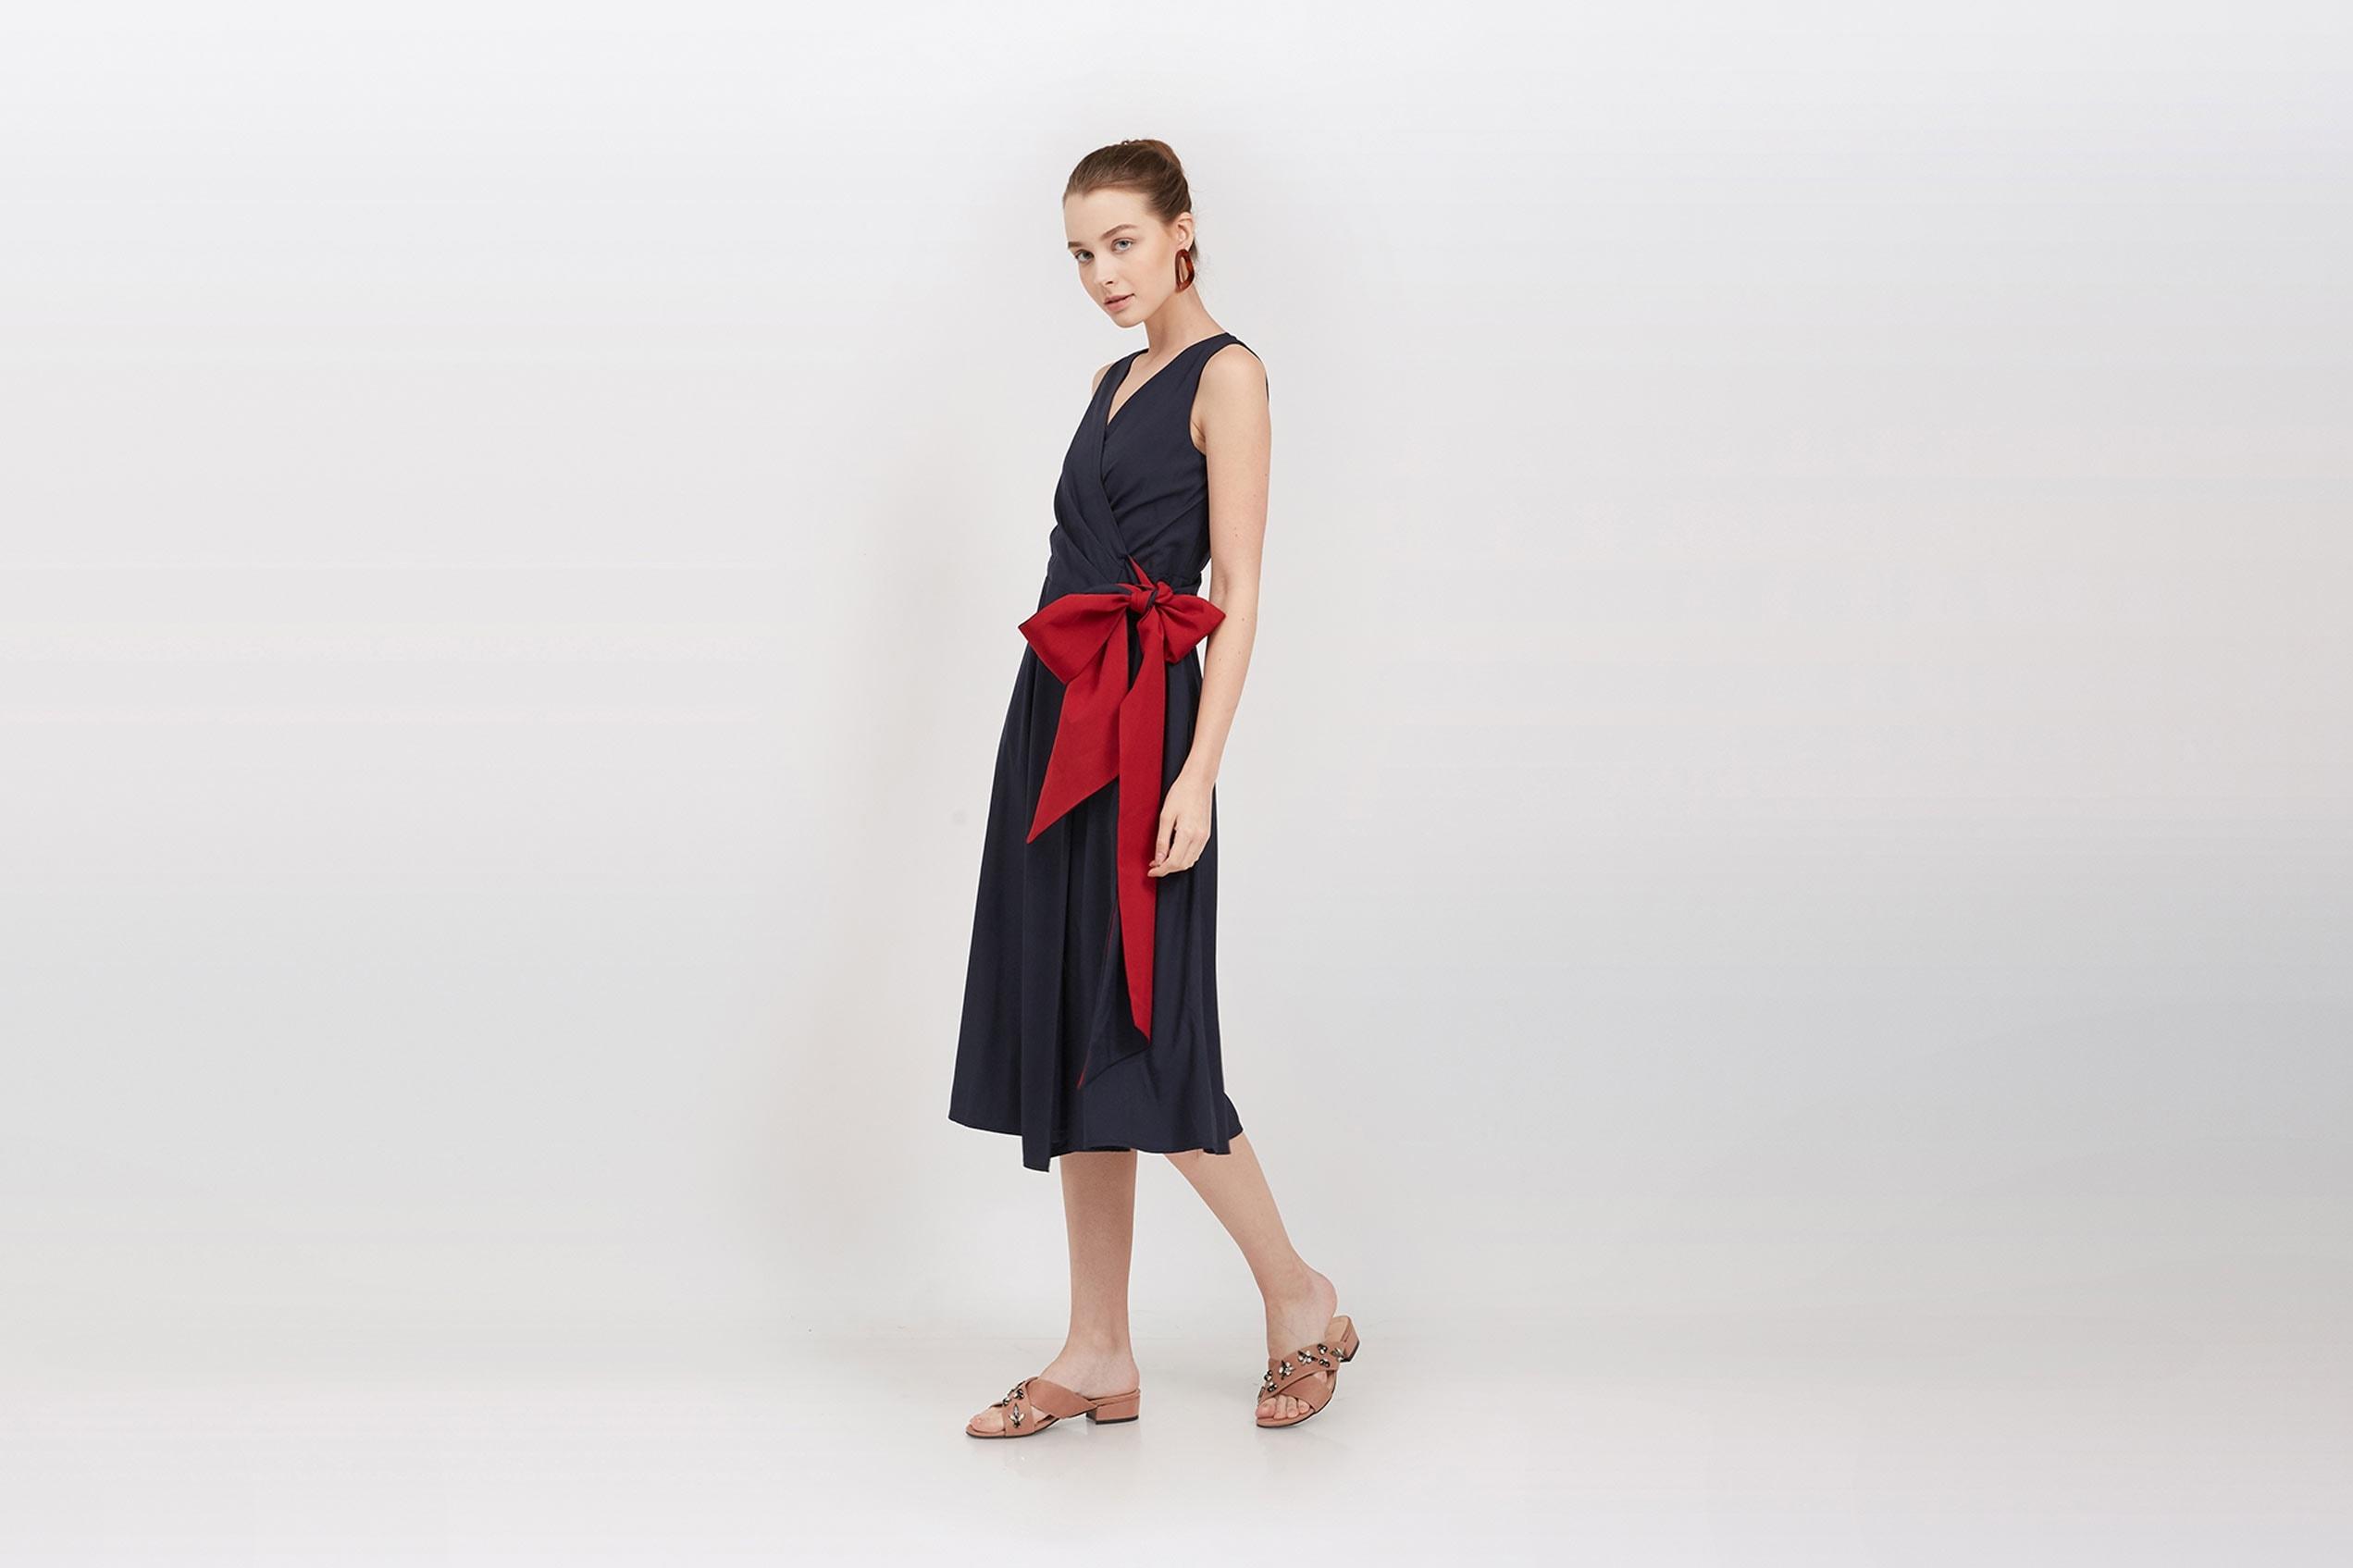 QLOTHÈ Estelle Wrap Dress, $69